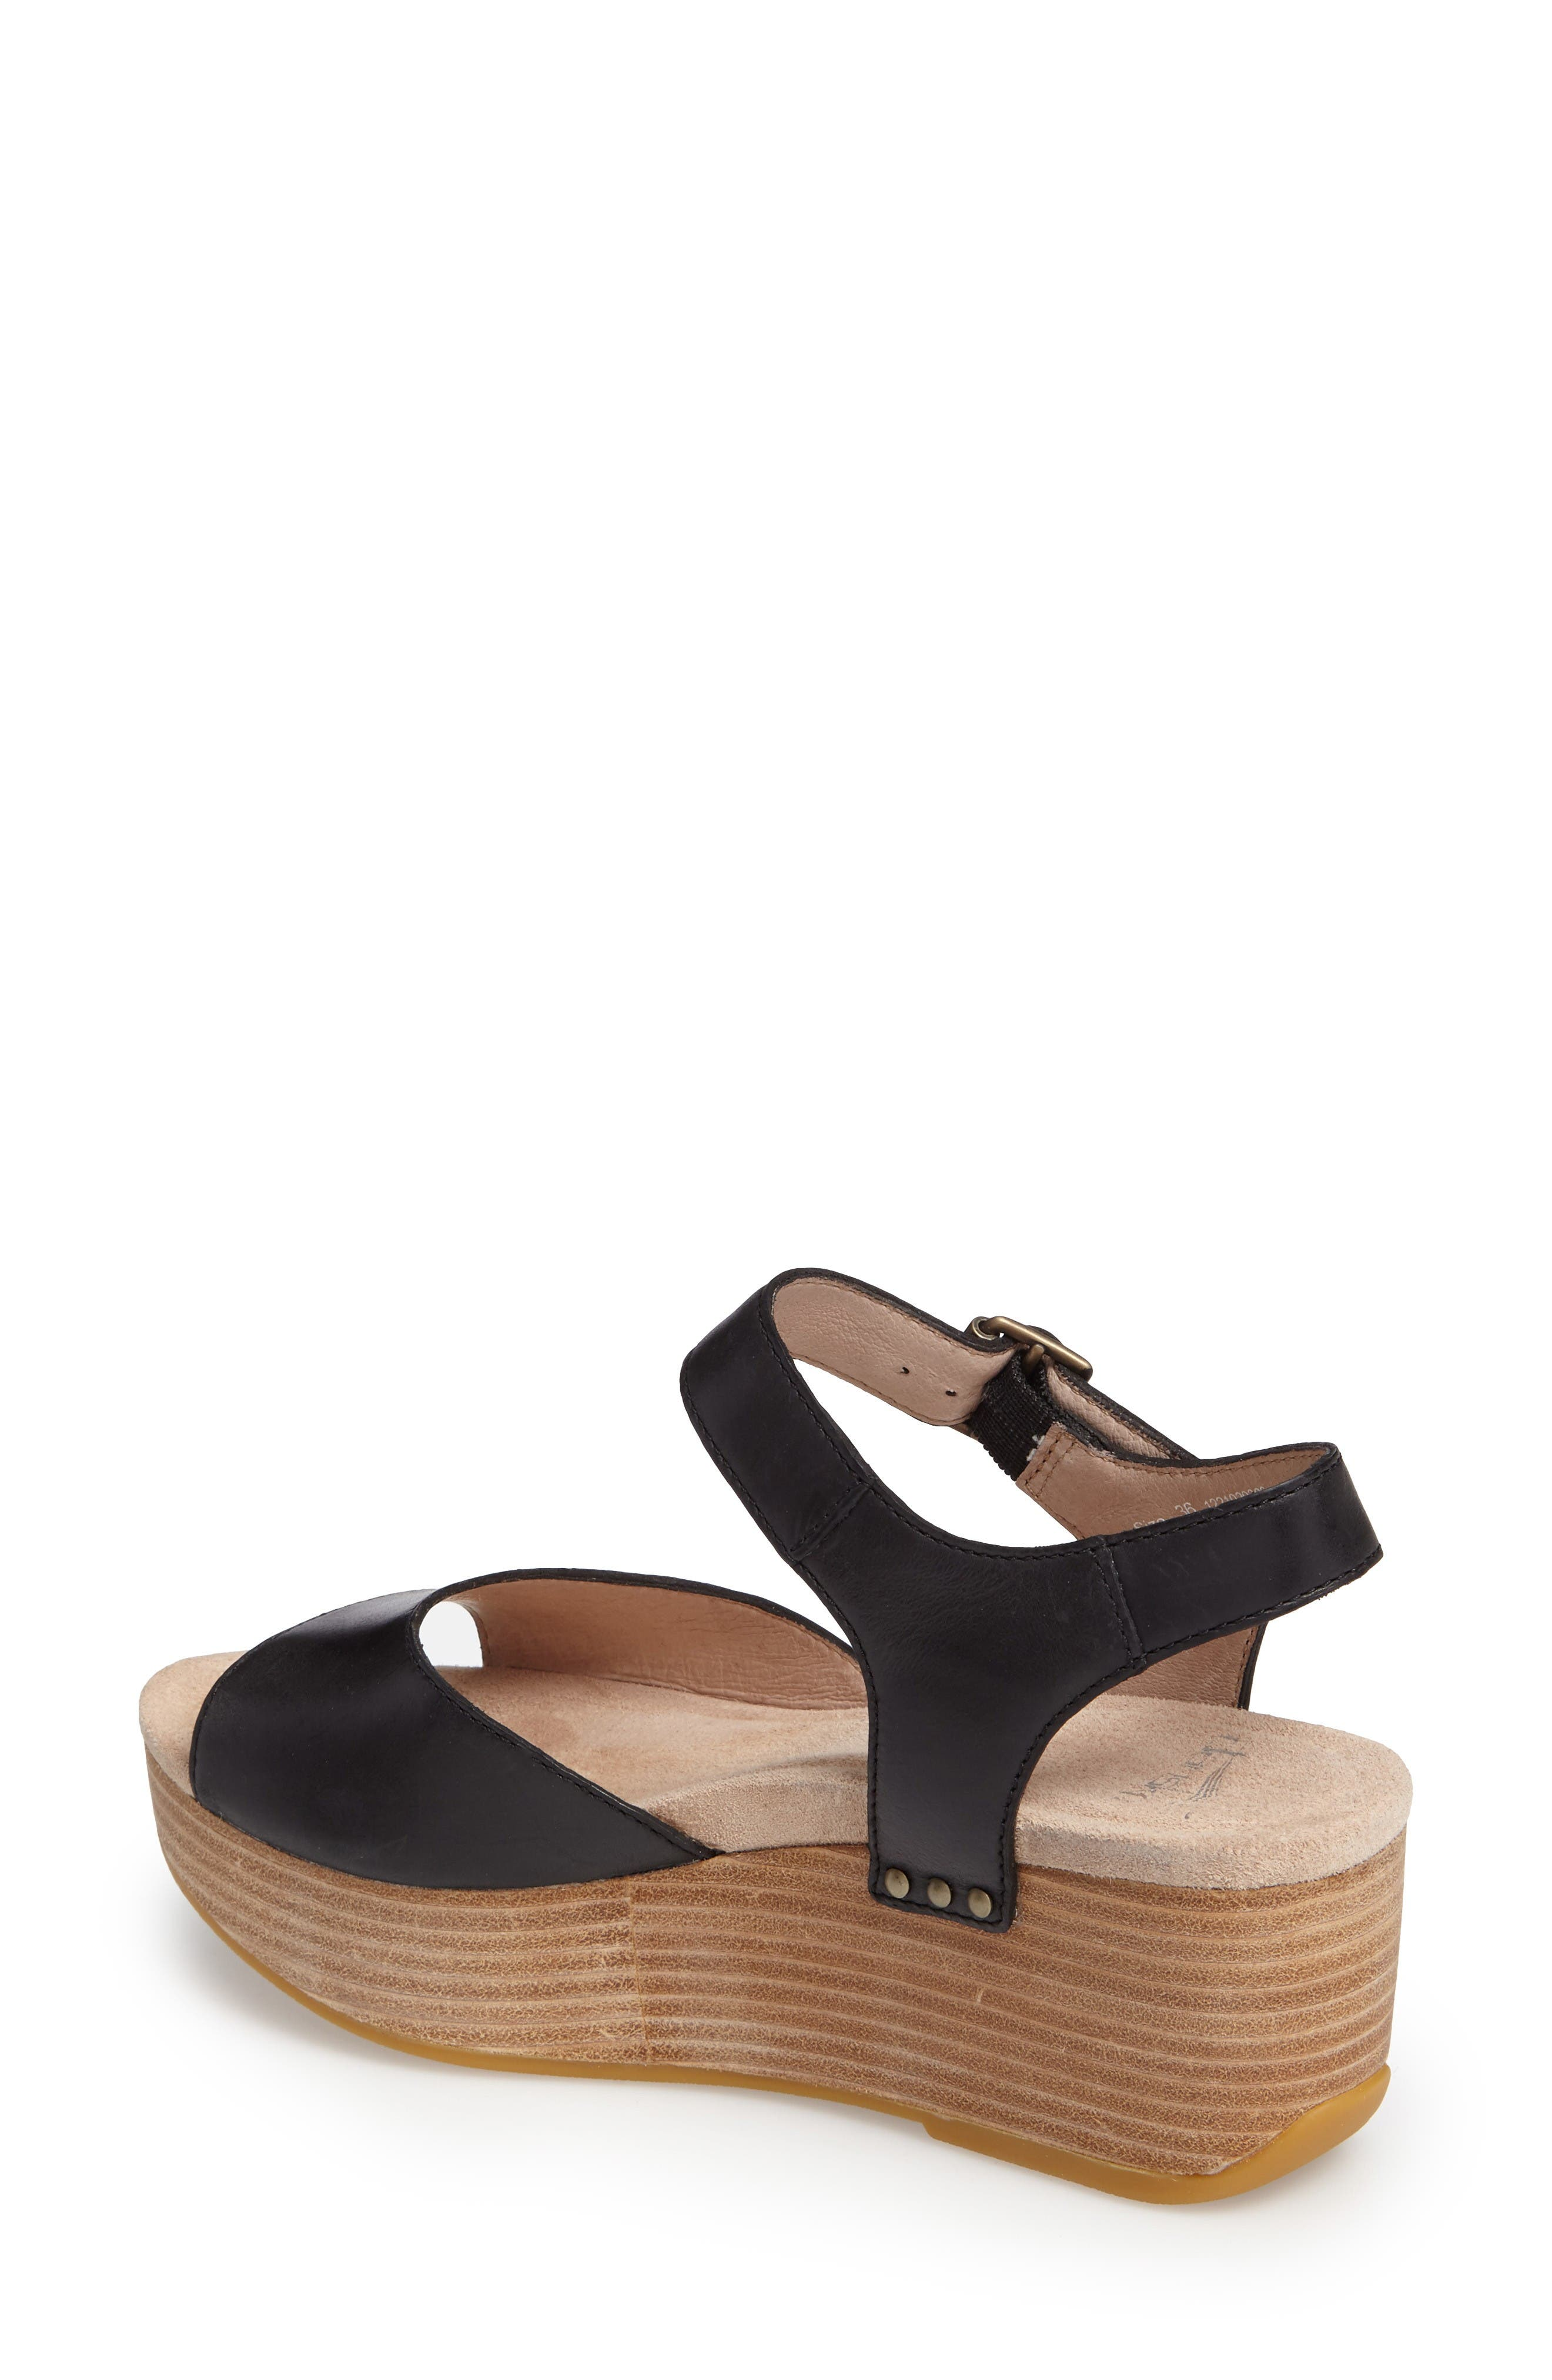 Silvie Platform Wedge Sandal,                             Alternate thumbnail 2, color,                             Black Leather